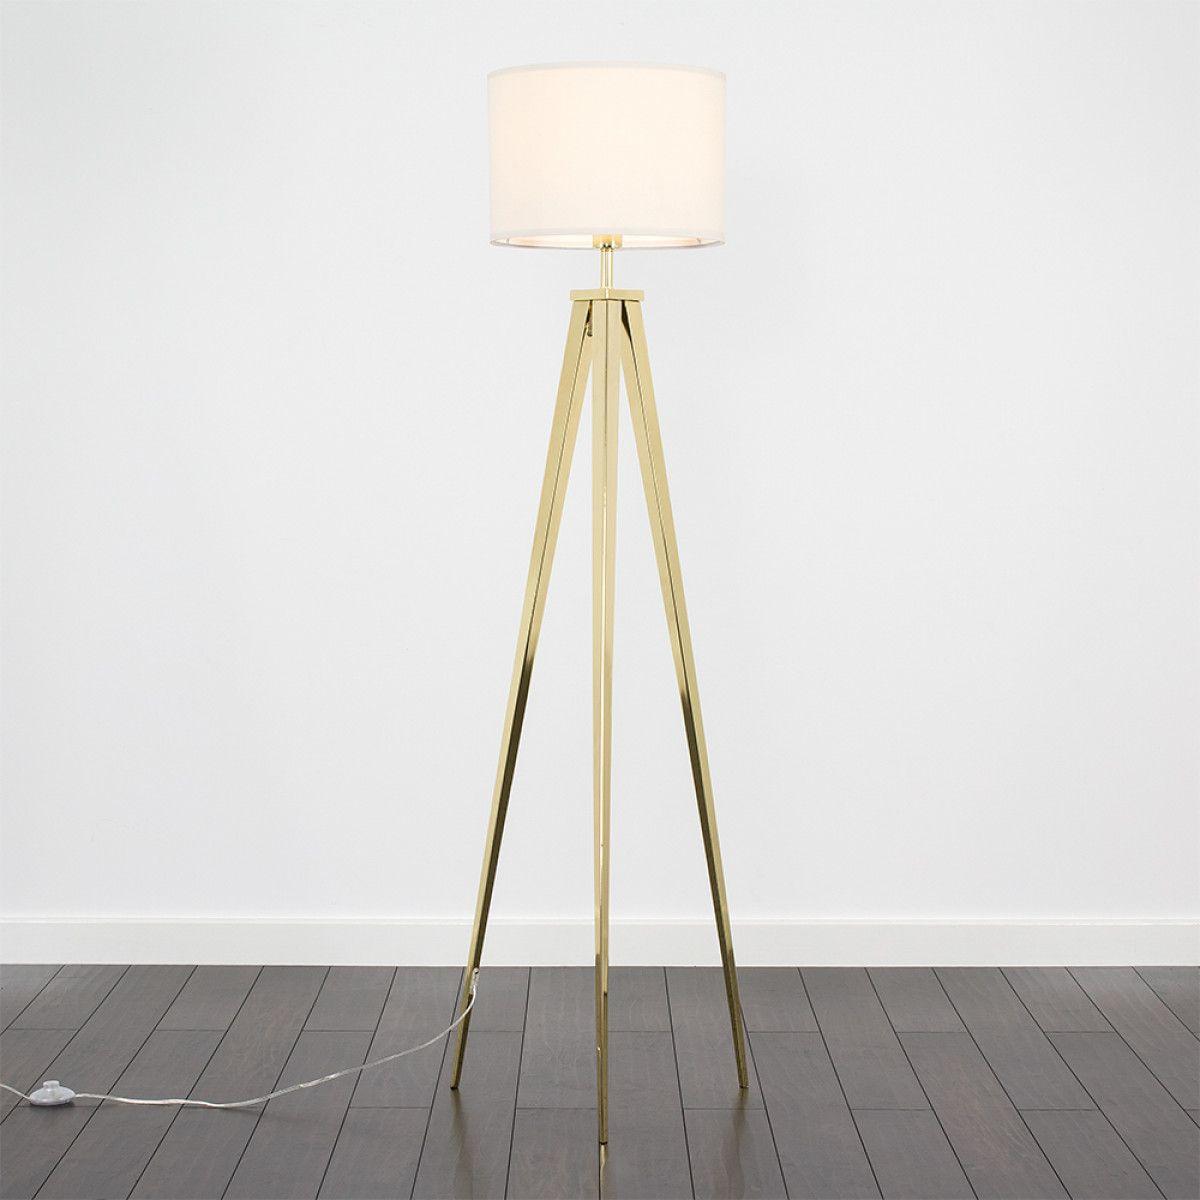 Nero Gold Tripod Floor Lamp Cream Shade Tripod Floor Lamps Floor Standing Lamps Gold Tripod Floor Lamp